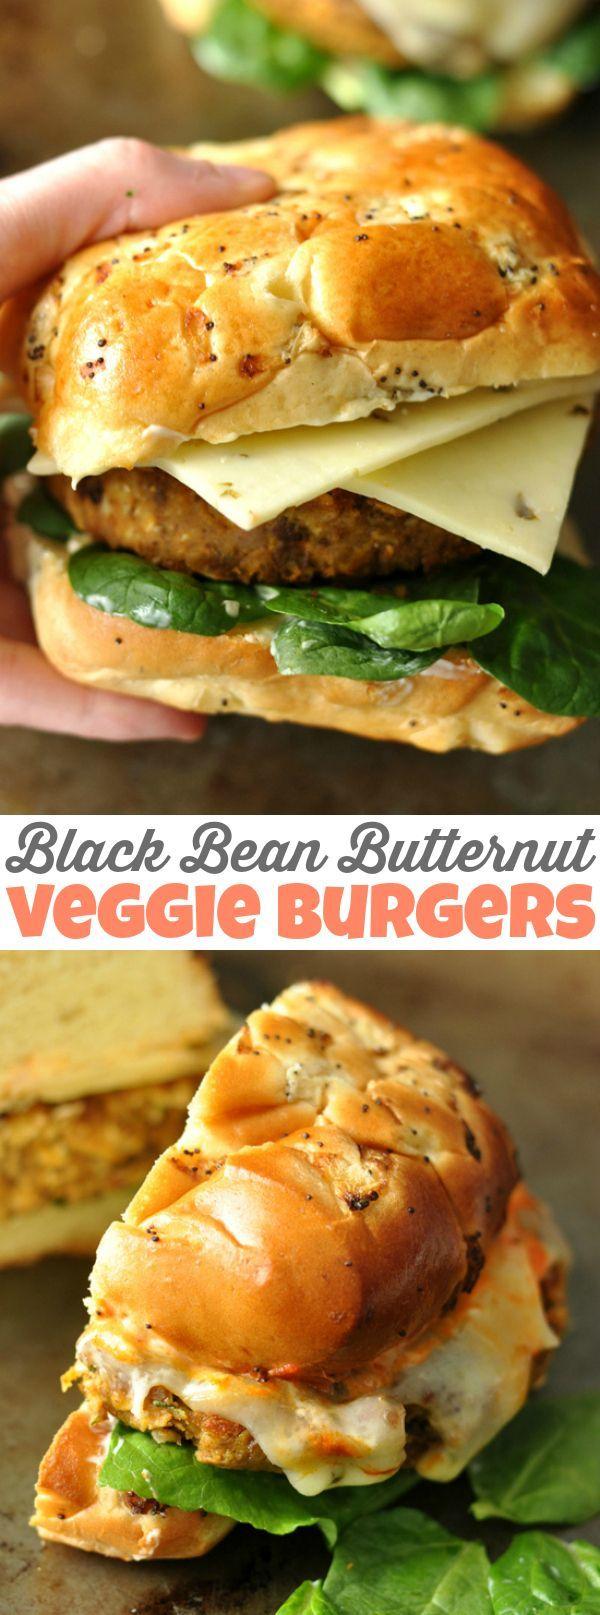 Healthy Homemade Black Bean Butternut Veggie Burgers